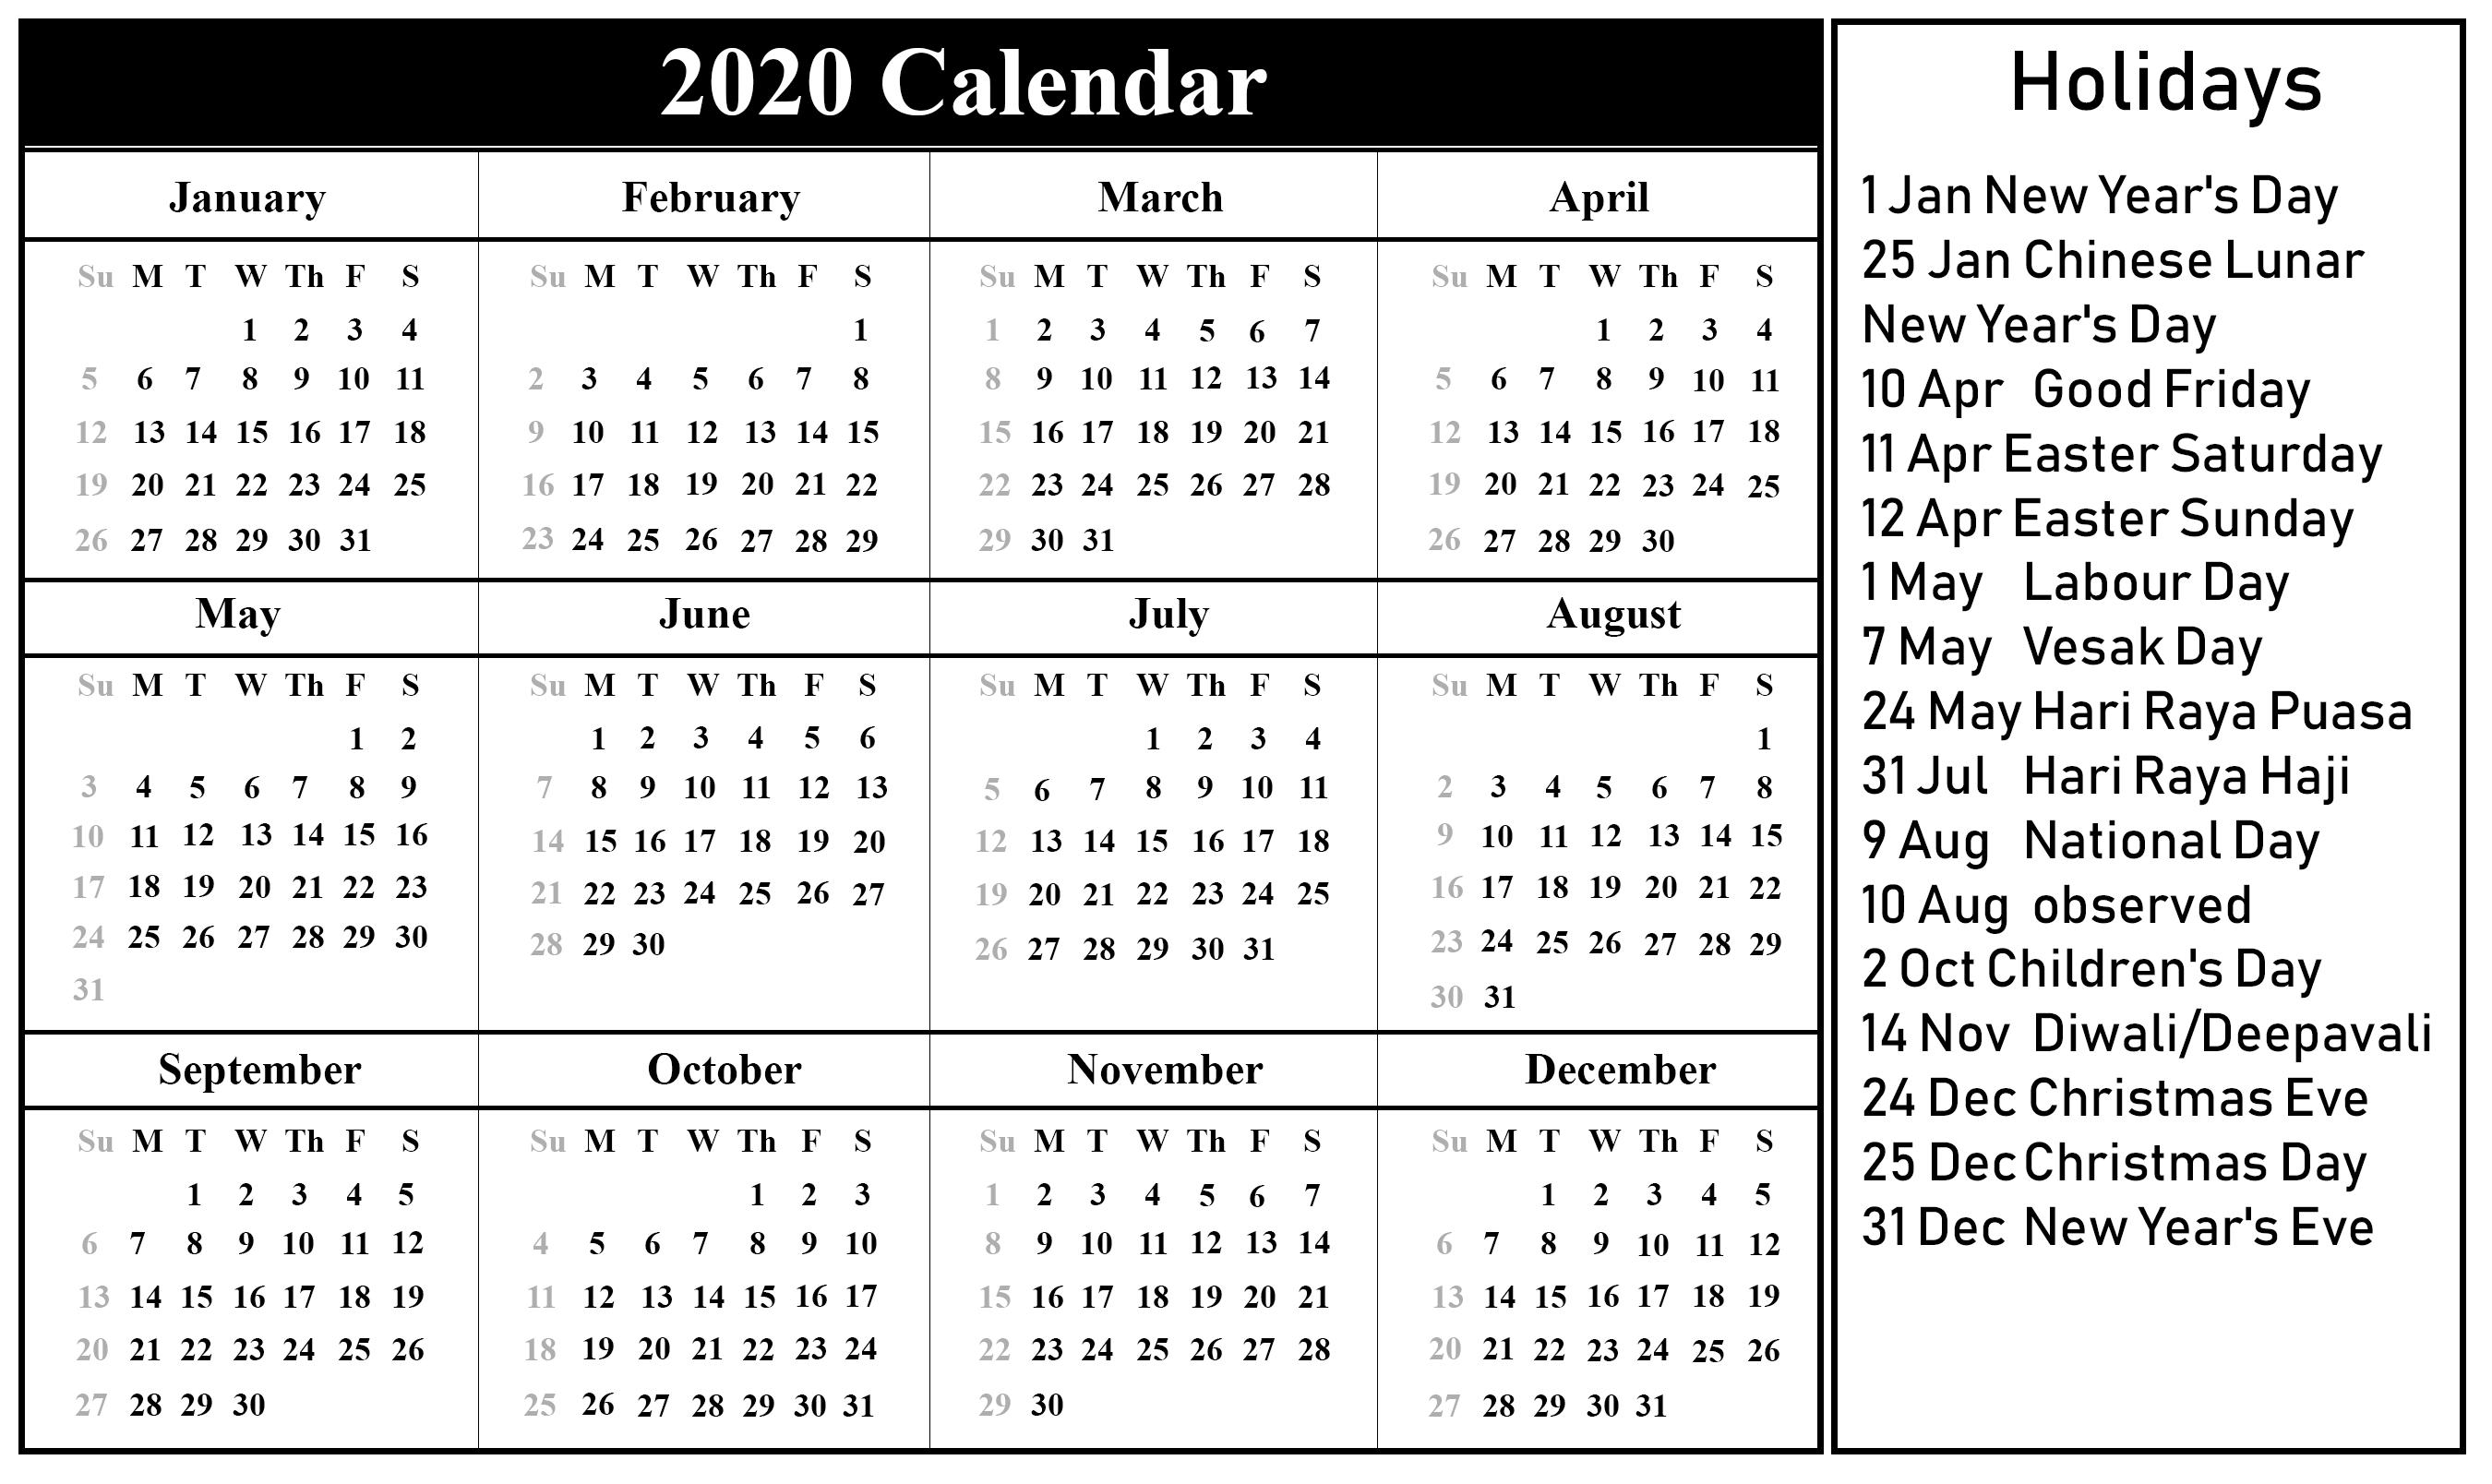 Printable 2020 Calendar with Holidays